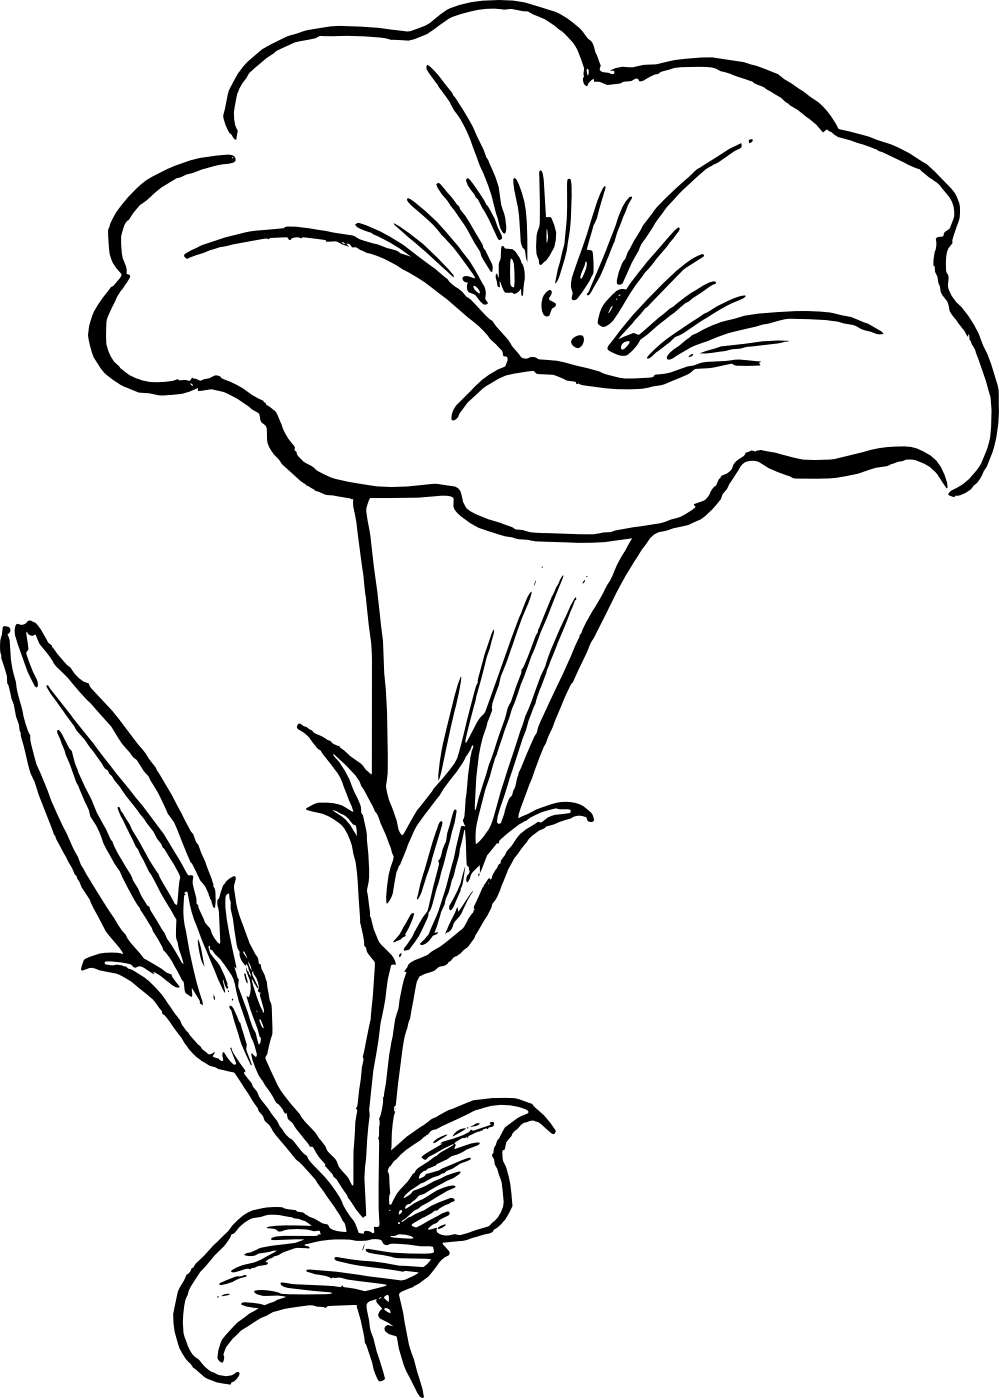 Bush clipart drawn Panda Clipart Clipart black%20and%20white%20flower%20drawing Black